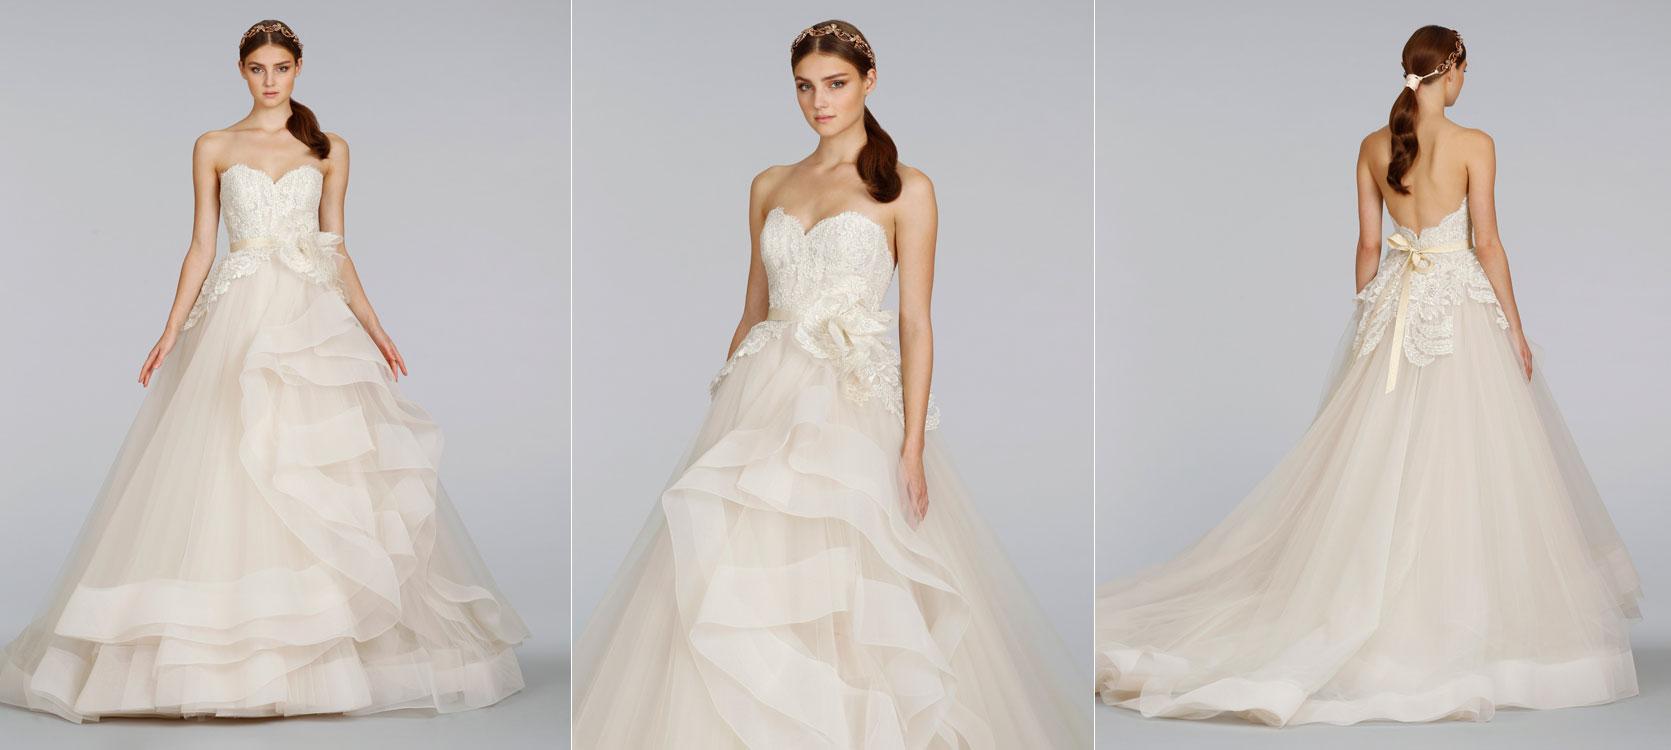 Bridal gowns wedding dresses by lazaro style lz3413 for Lazaro lace wedding dress